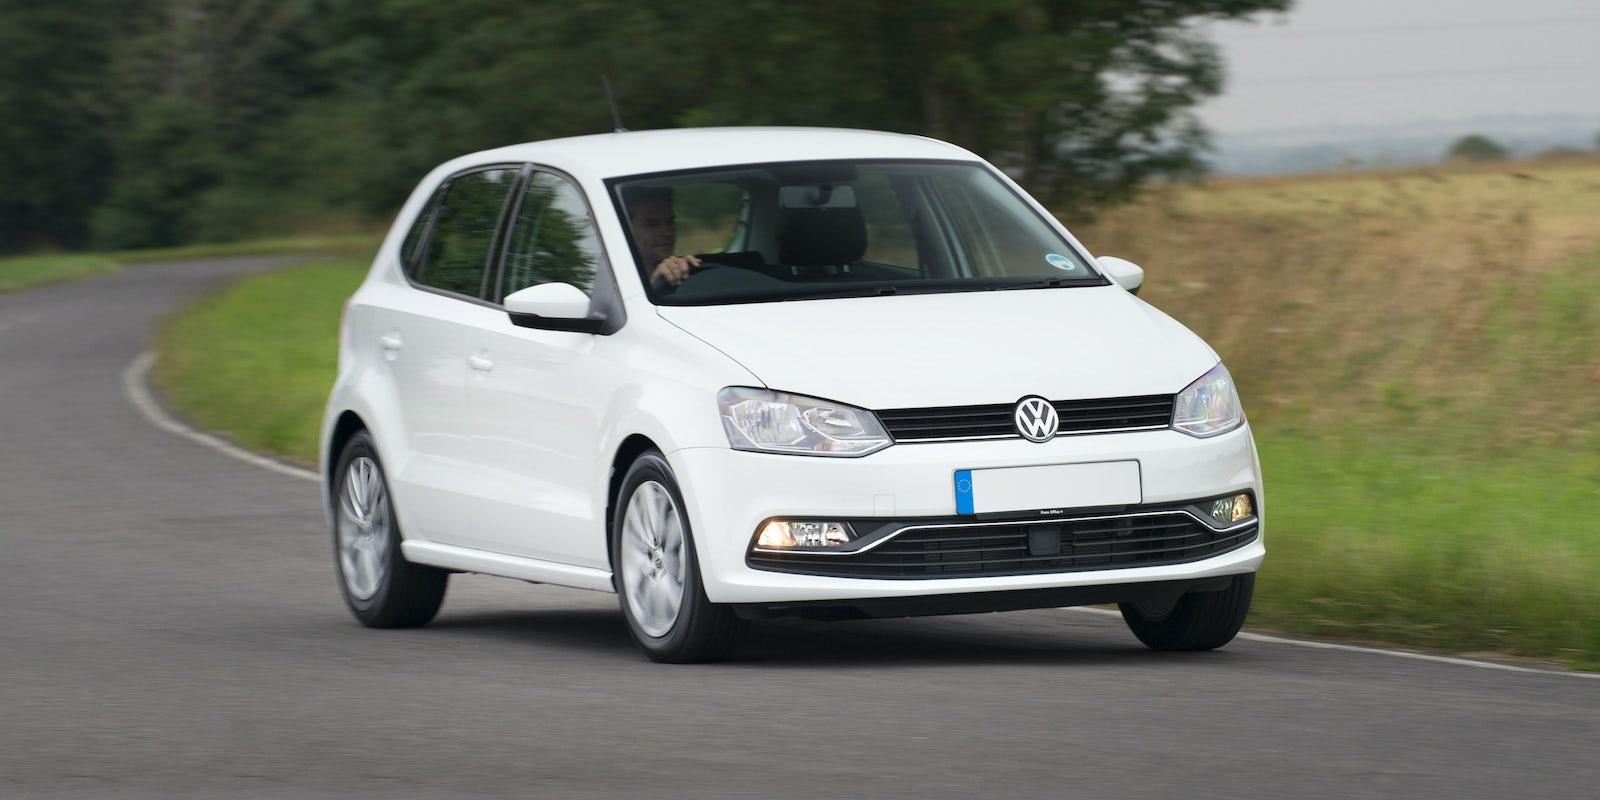 Volkswagen polo 2010 model araba resimleri - Good Visibility Makes The Polo Easy To Drive